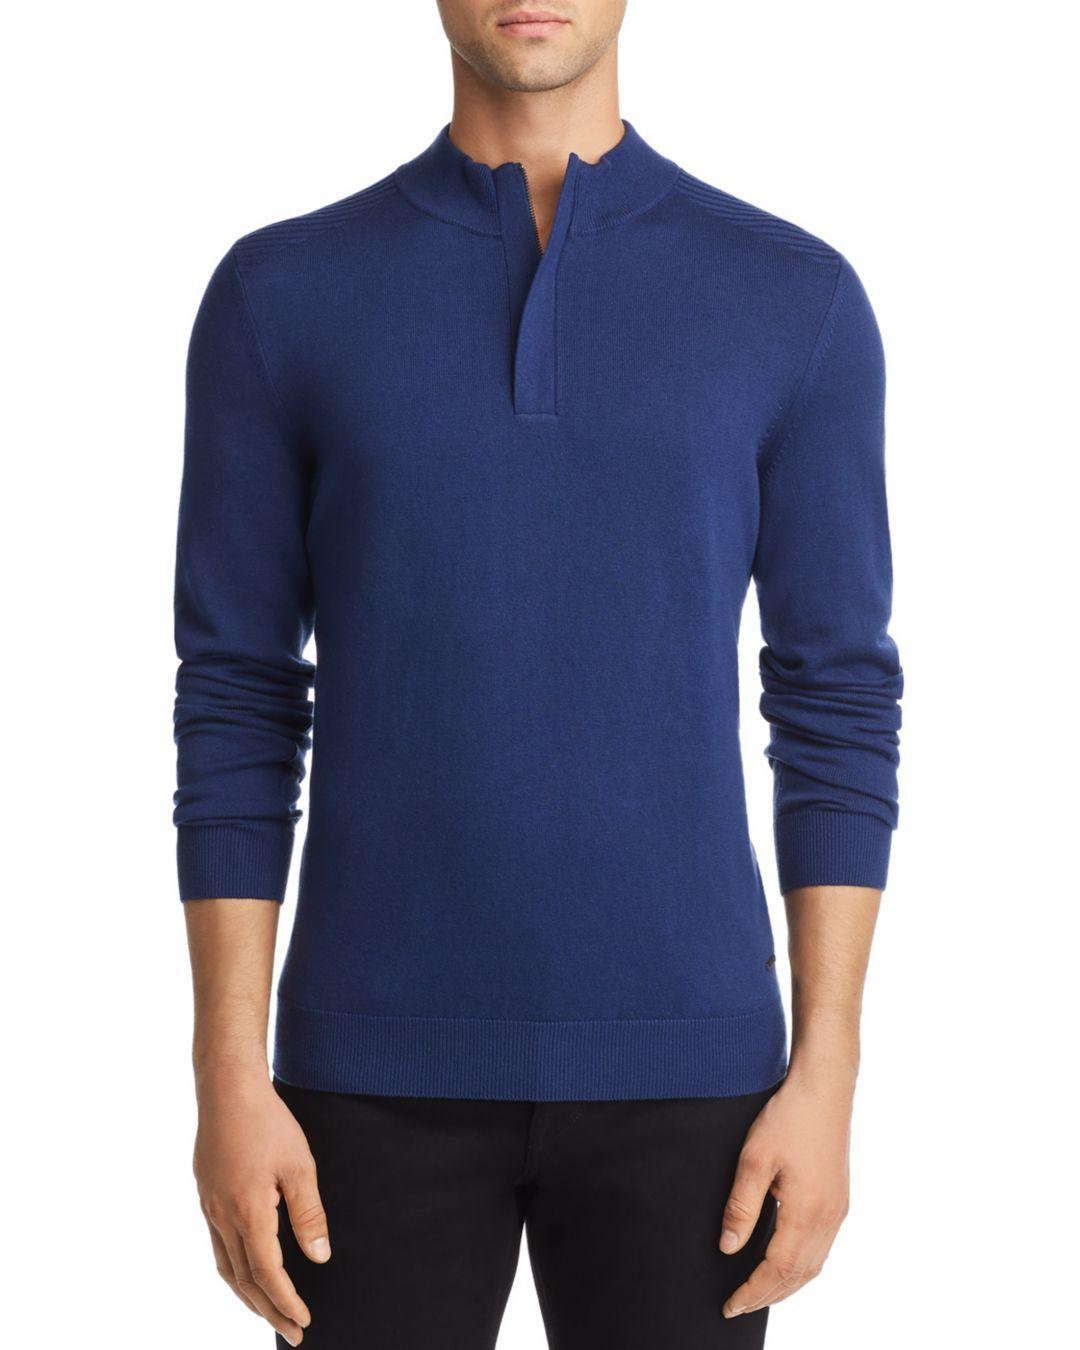 7bda8e340 BOSS Boss Esilvio Quarter Zip Pullover in Blue for Men - Lyst